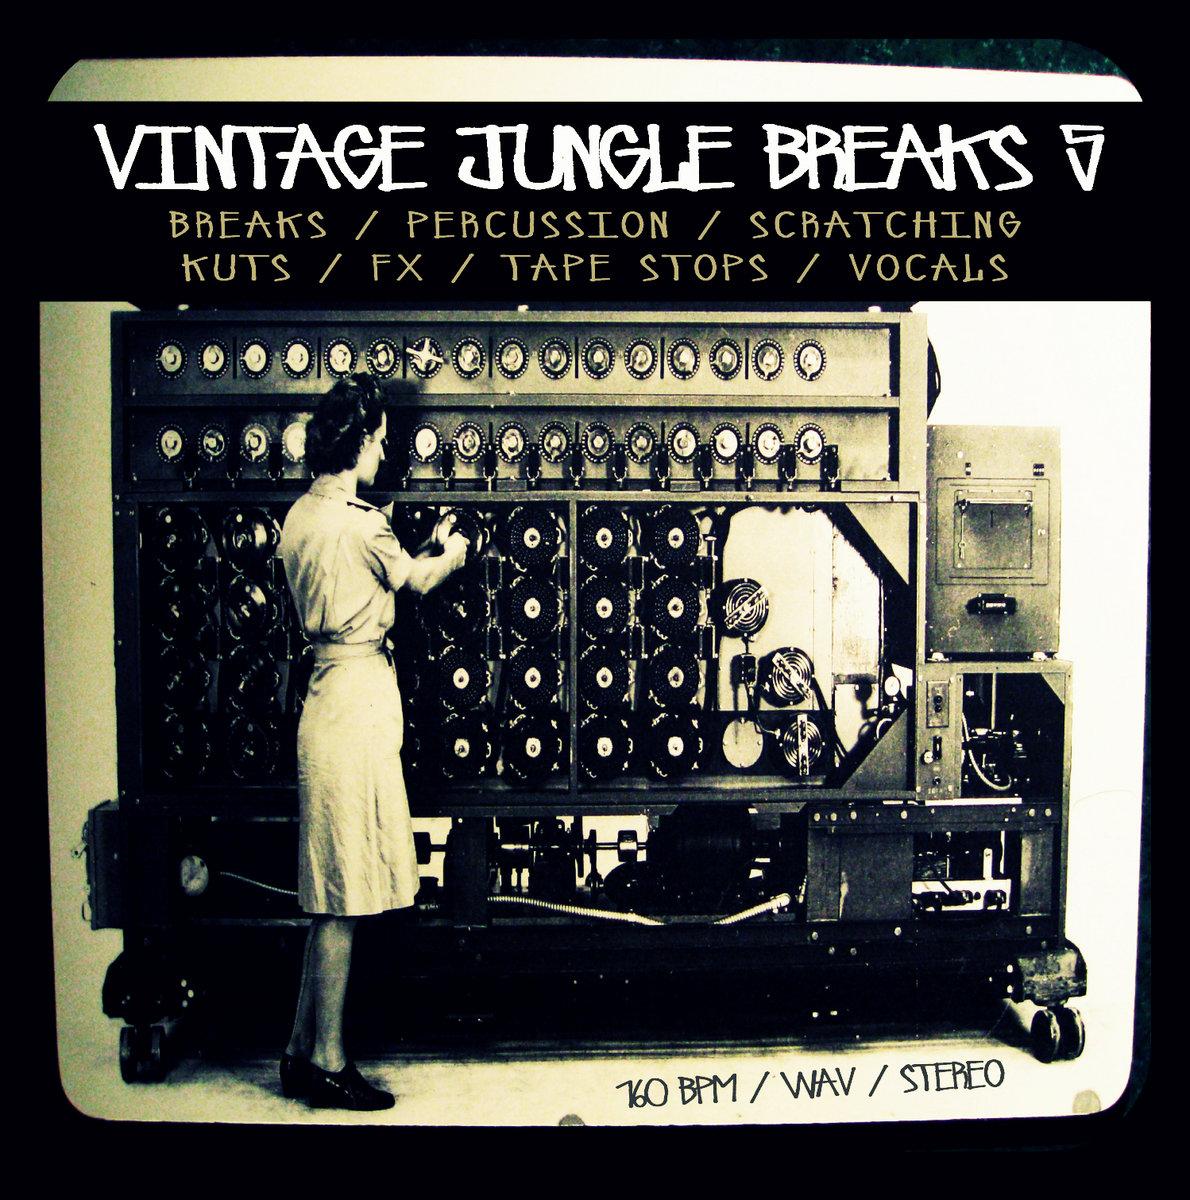 Vintage Jungle Breaks 5 | 6Blocc